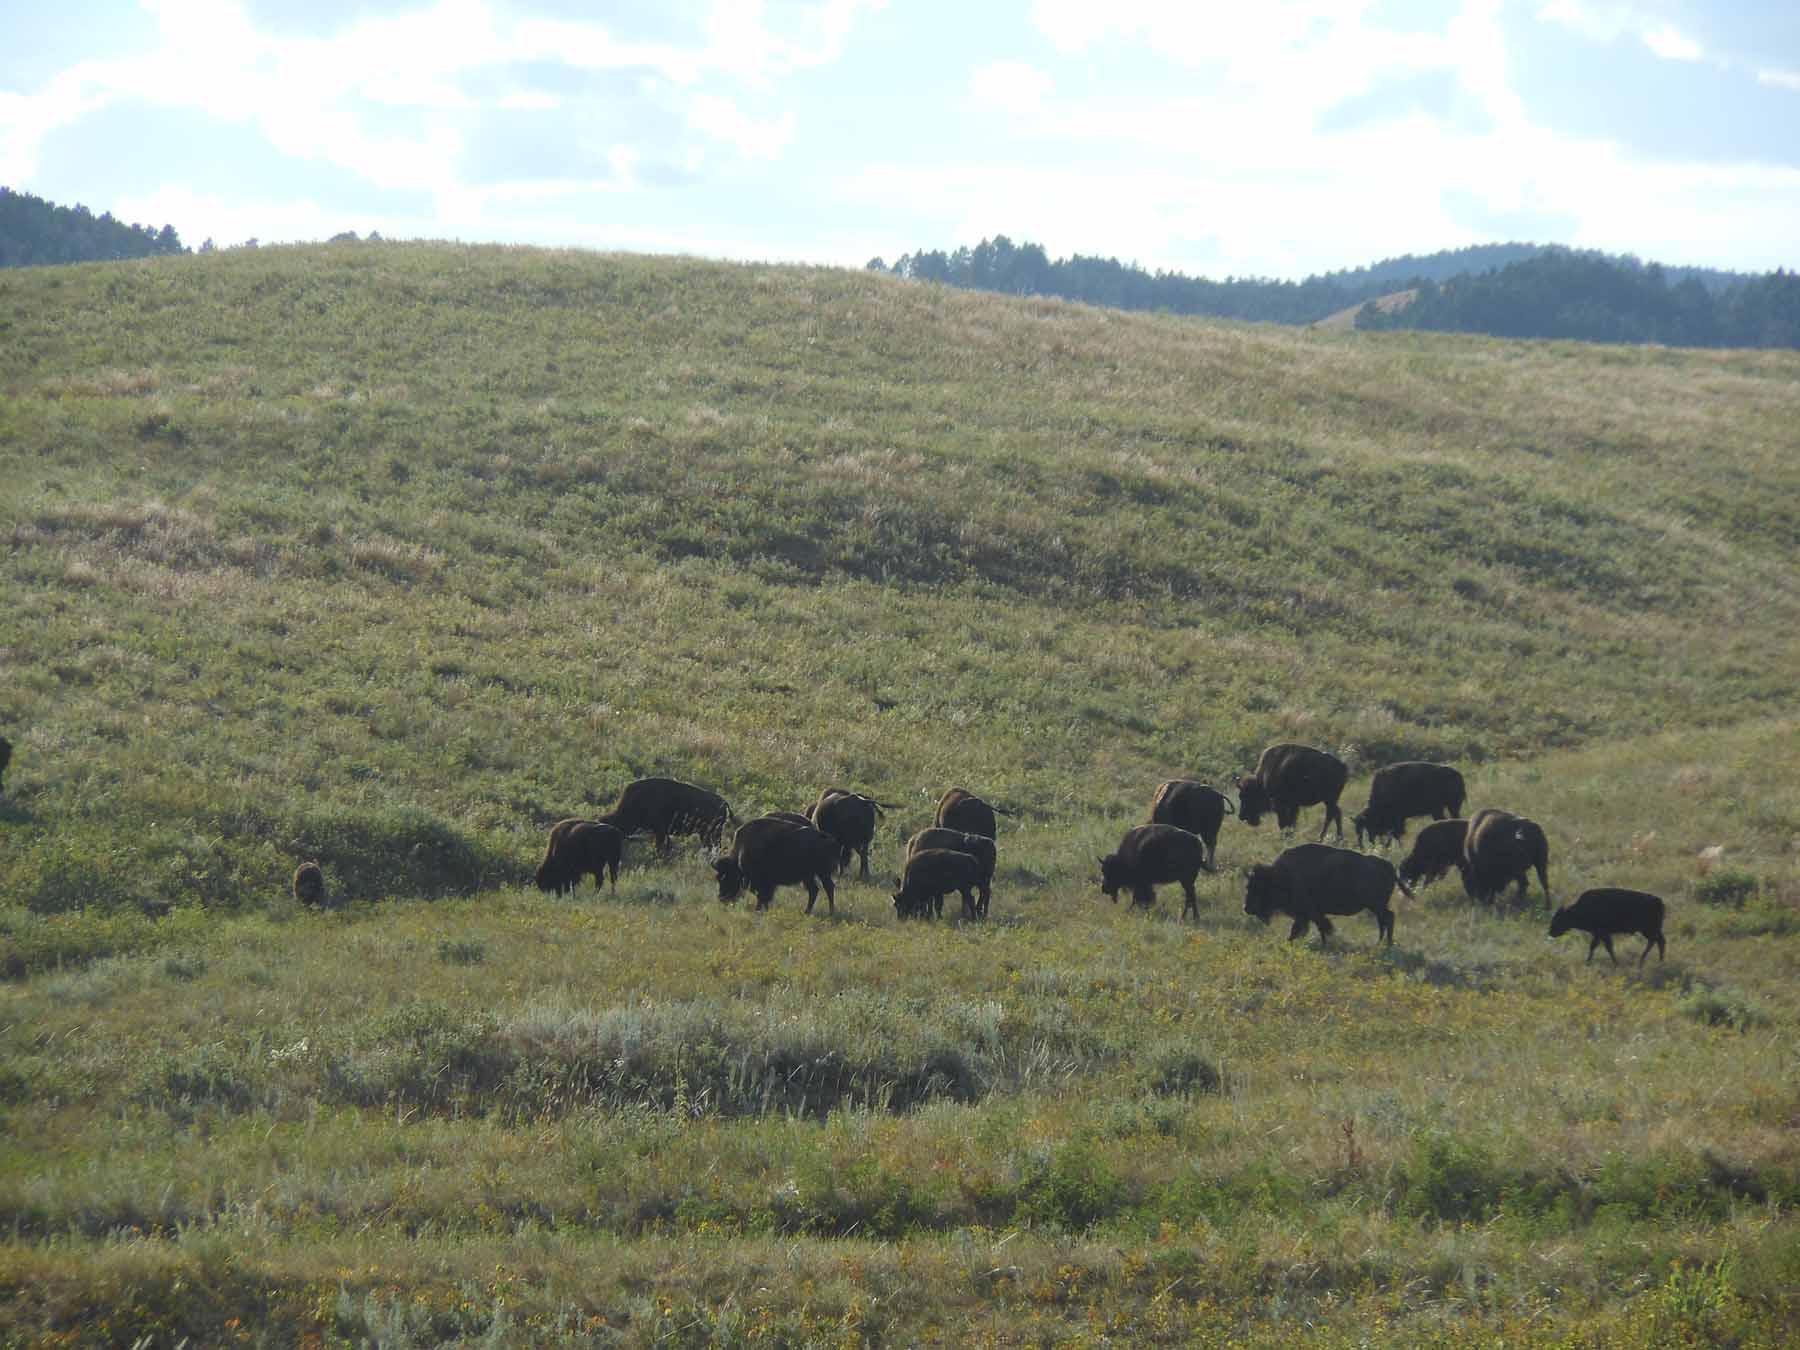 Buffalo at a distance.